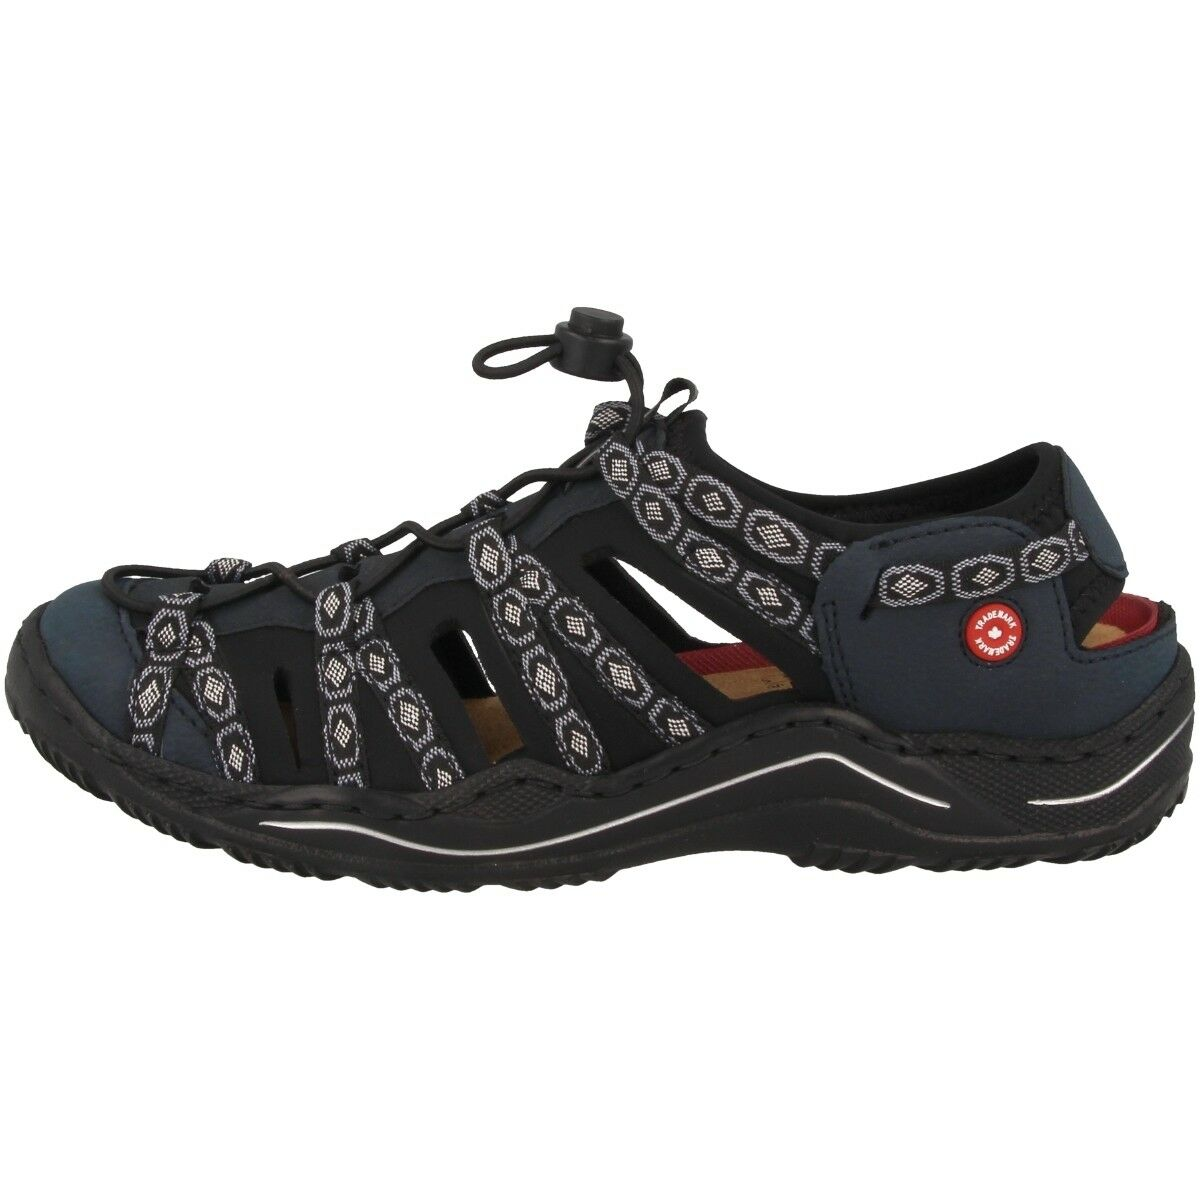 Rieker BUKINA-Namur Zapatos señora anti estrés outdoor cortos sandalia l0577-15